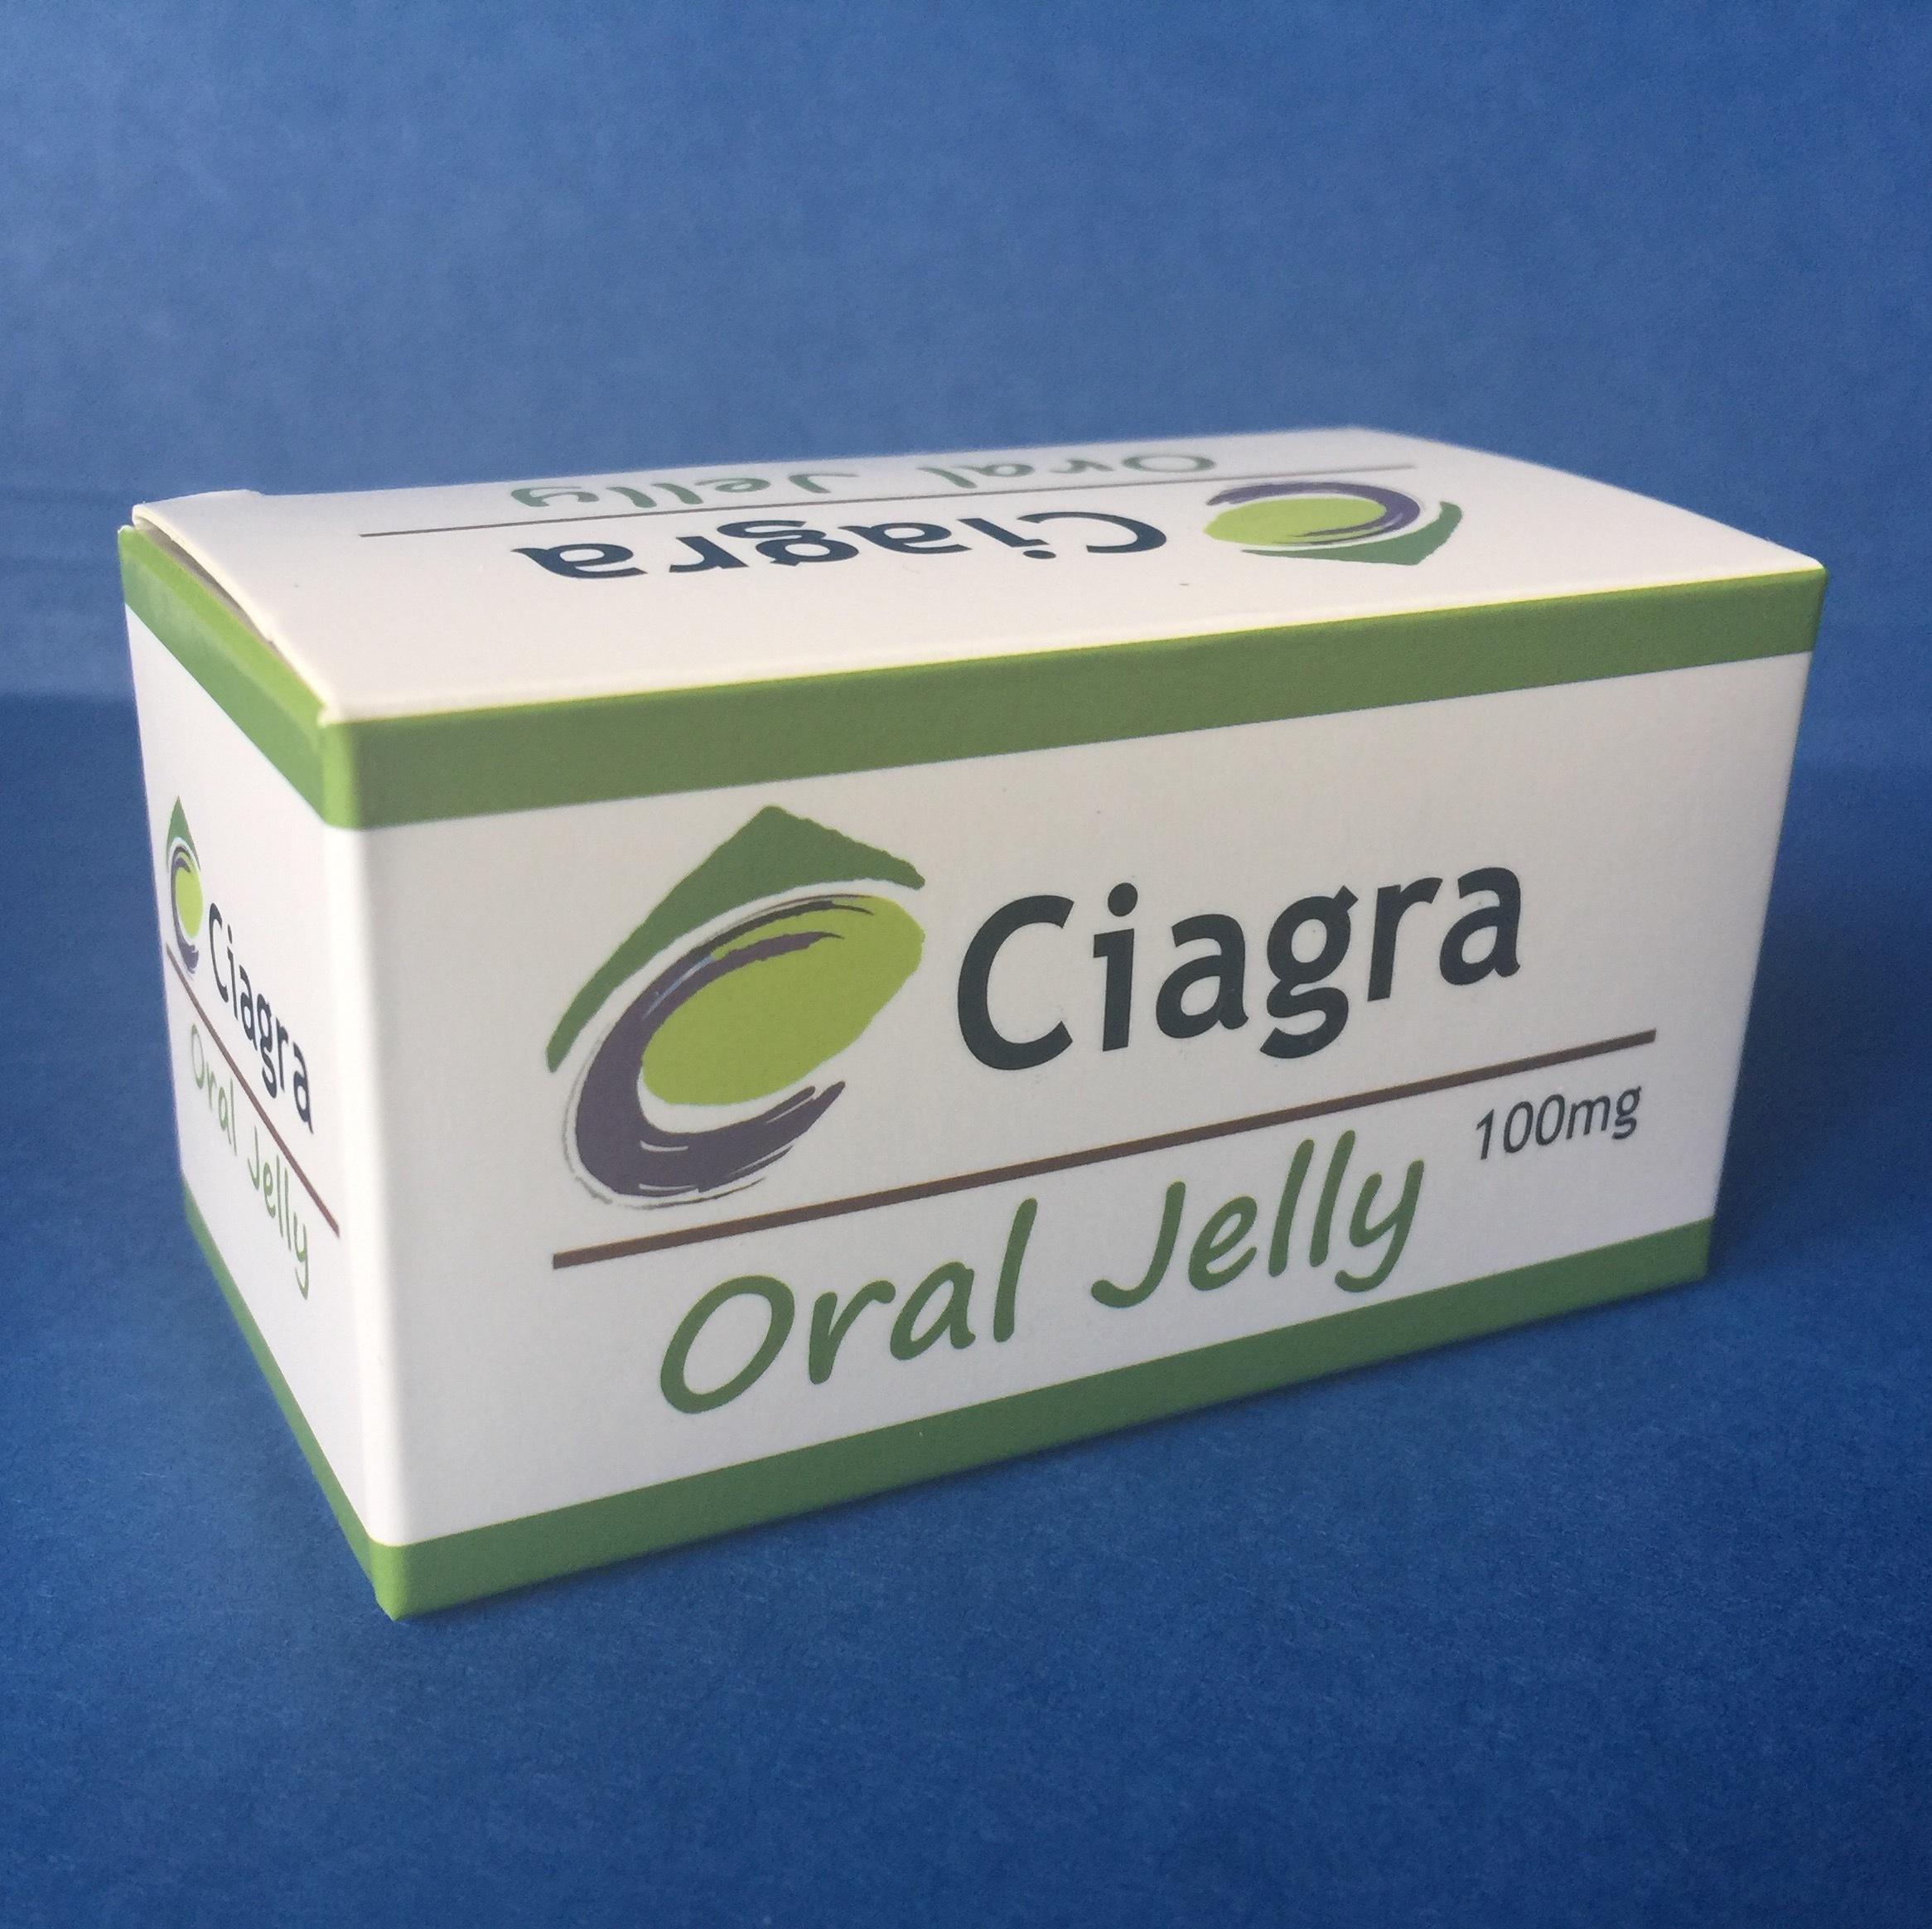 kamagra 100mg oral jelly notice